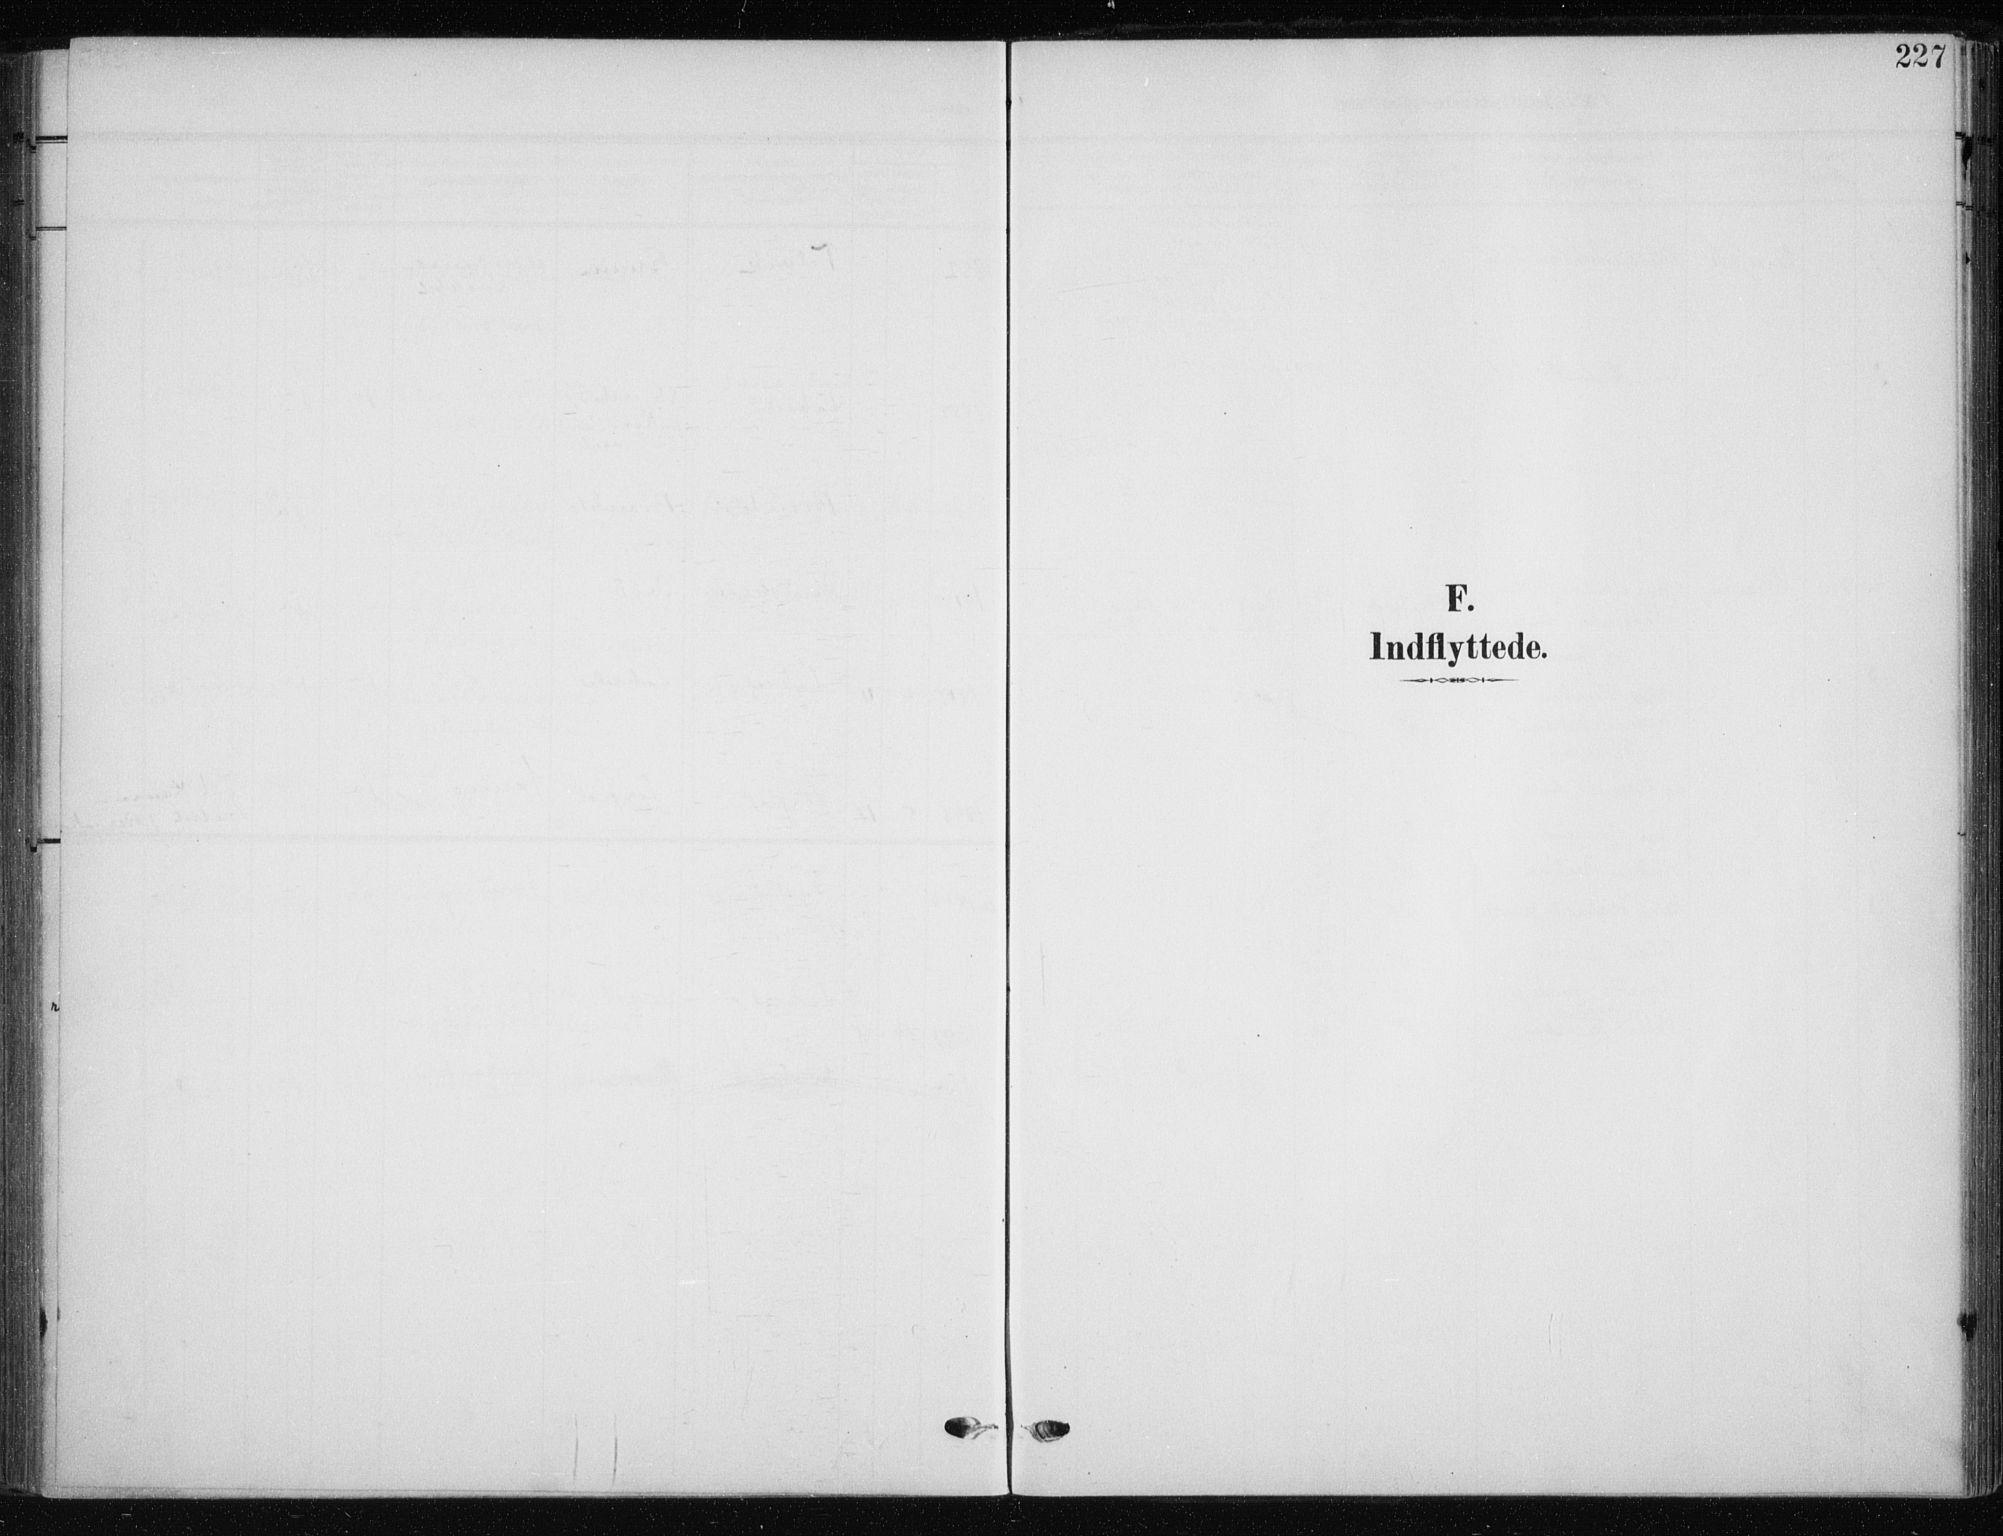 SATØ, Kistrand/Porsanger sokneprestembete, H/Ha/L0014.kirke: Ministerialbok nr. 14, 1908-1917, s. 227